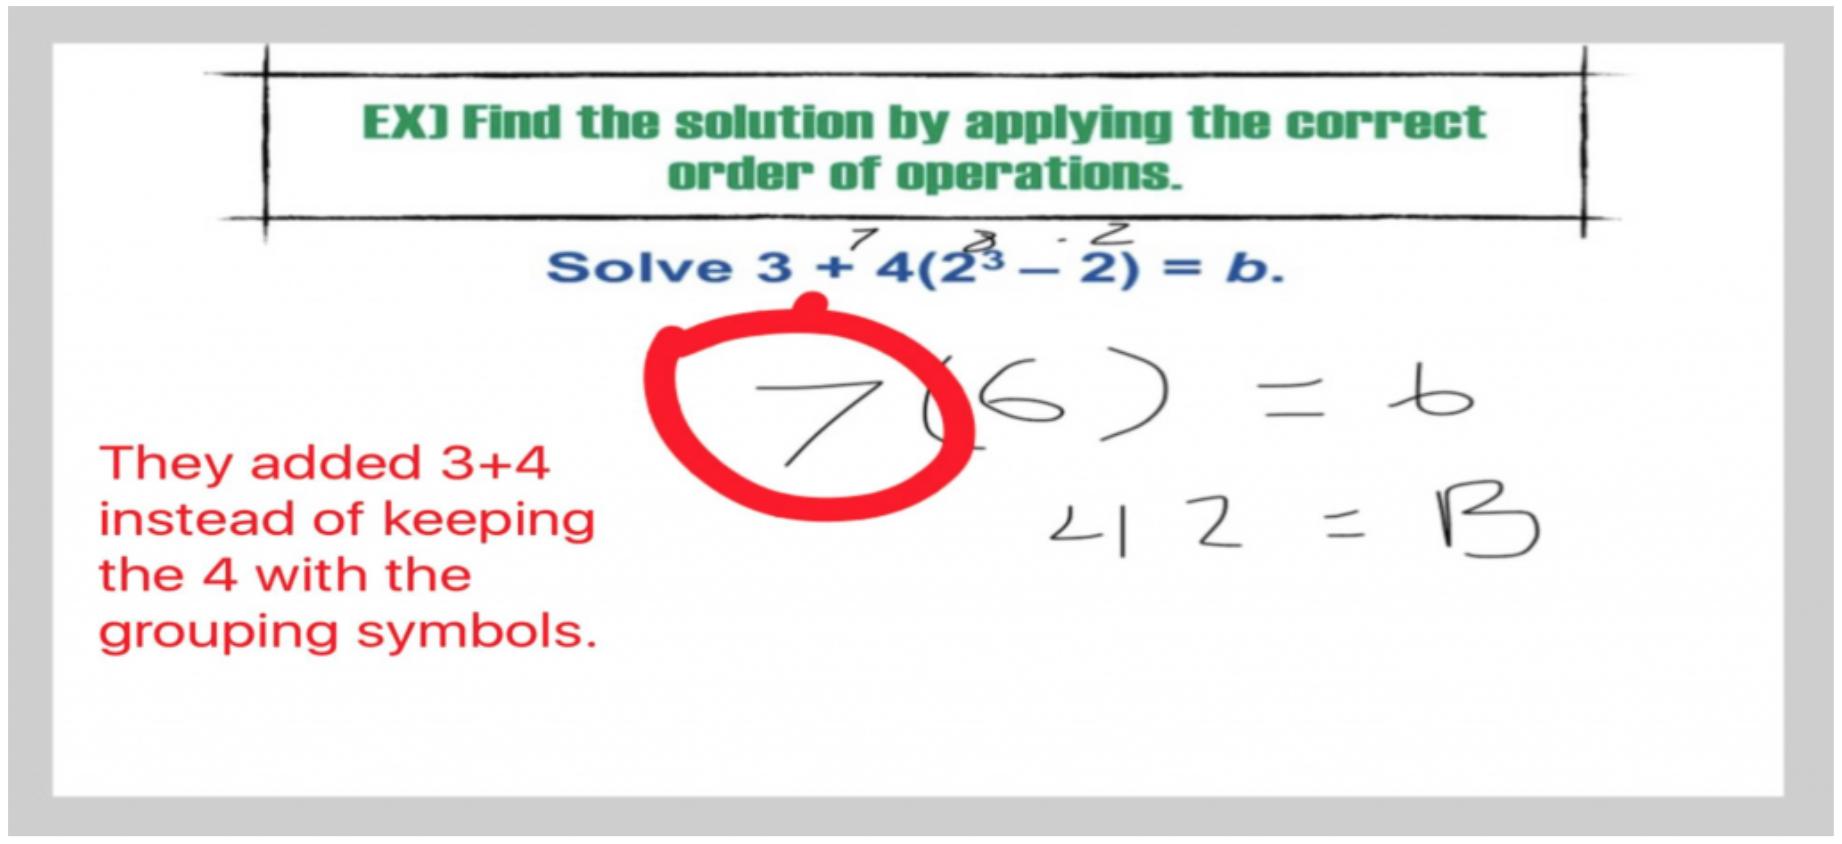 Nearpod Best Practices For Math Class V20 Nearpod Blog